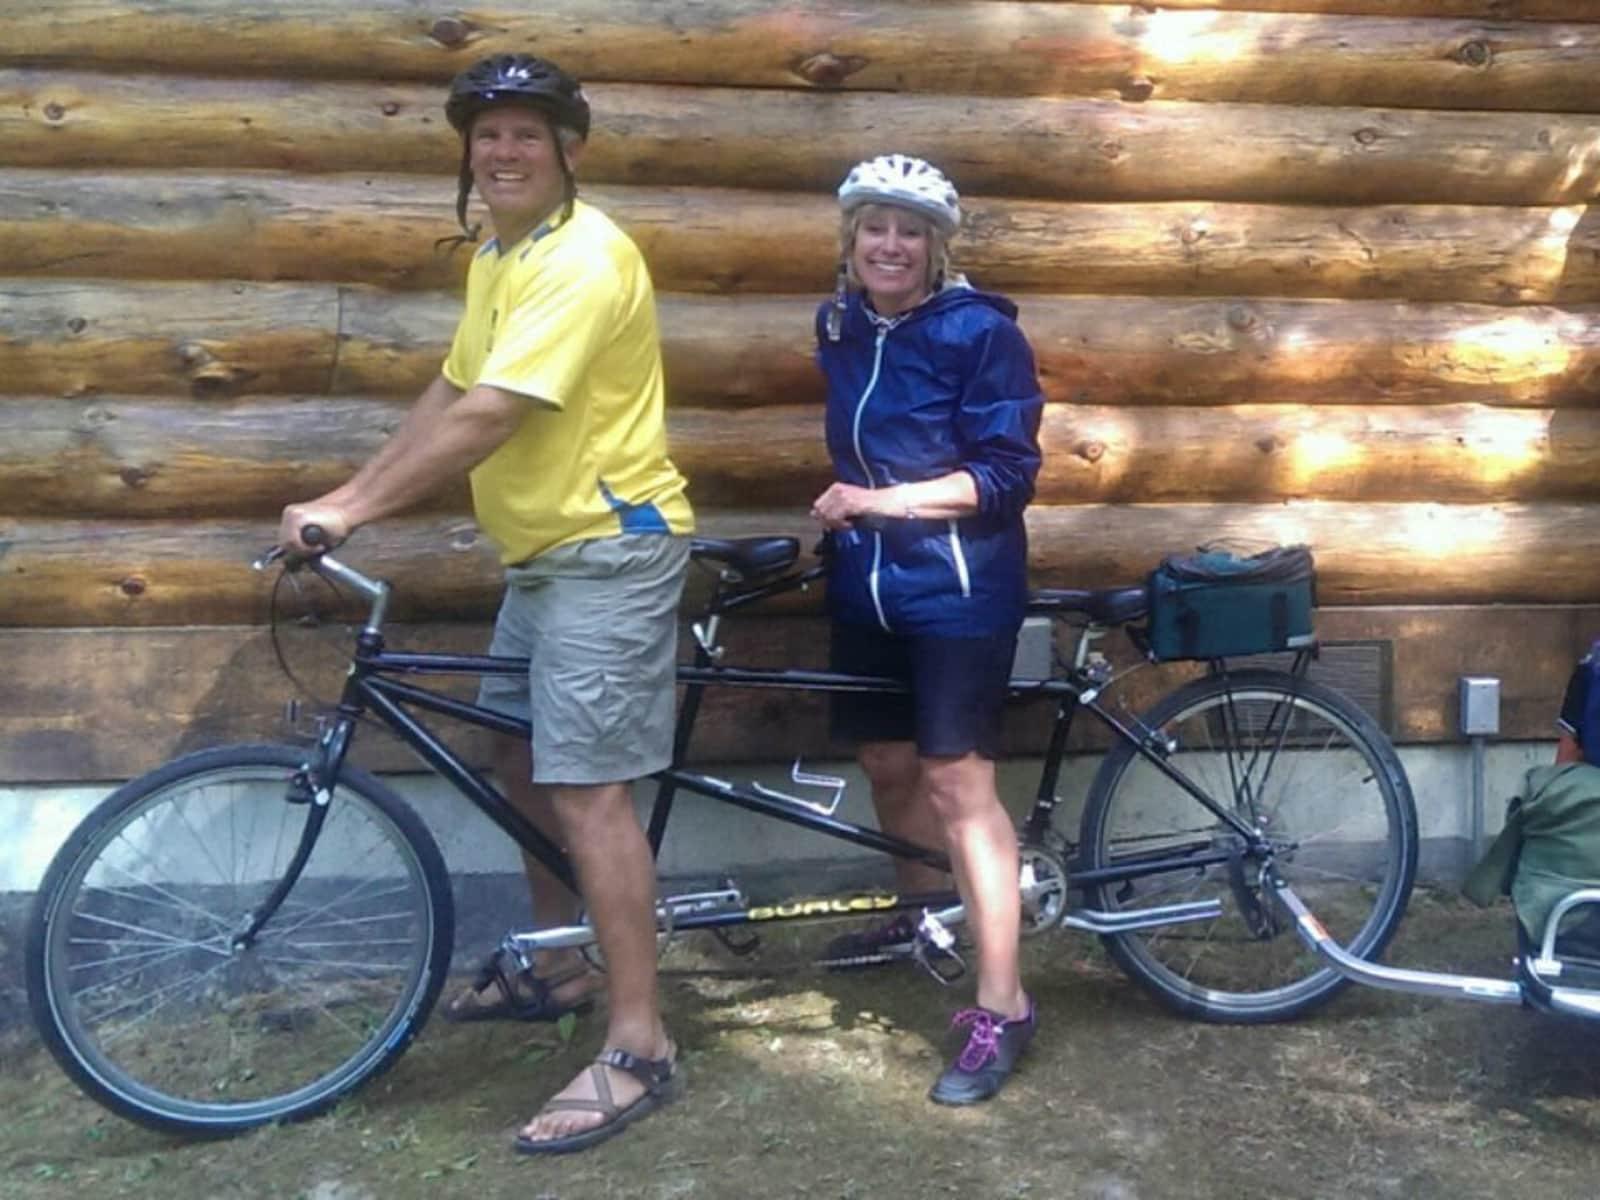 Debra & Craig arthur from Olympia, Washington, United States